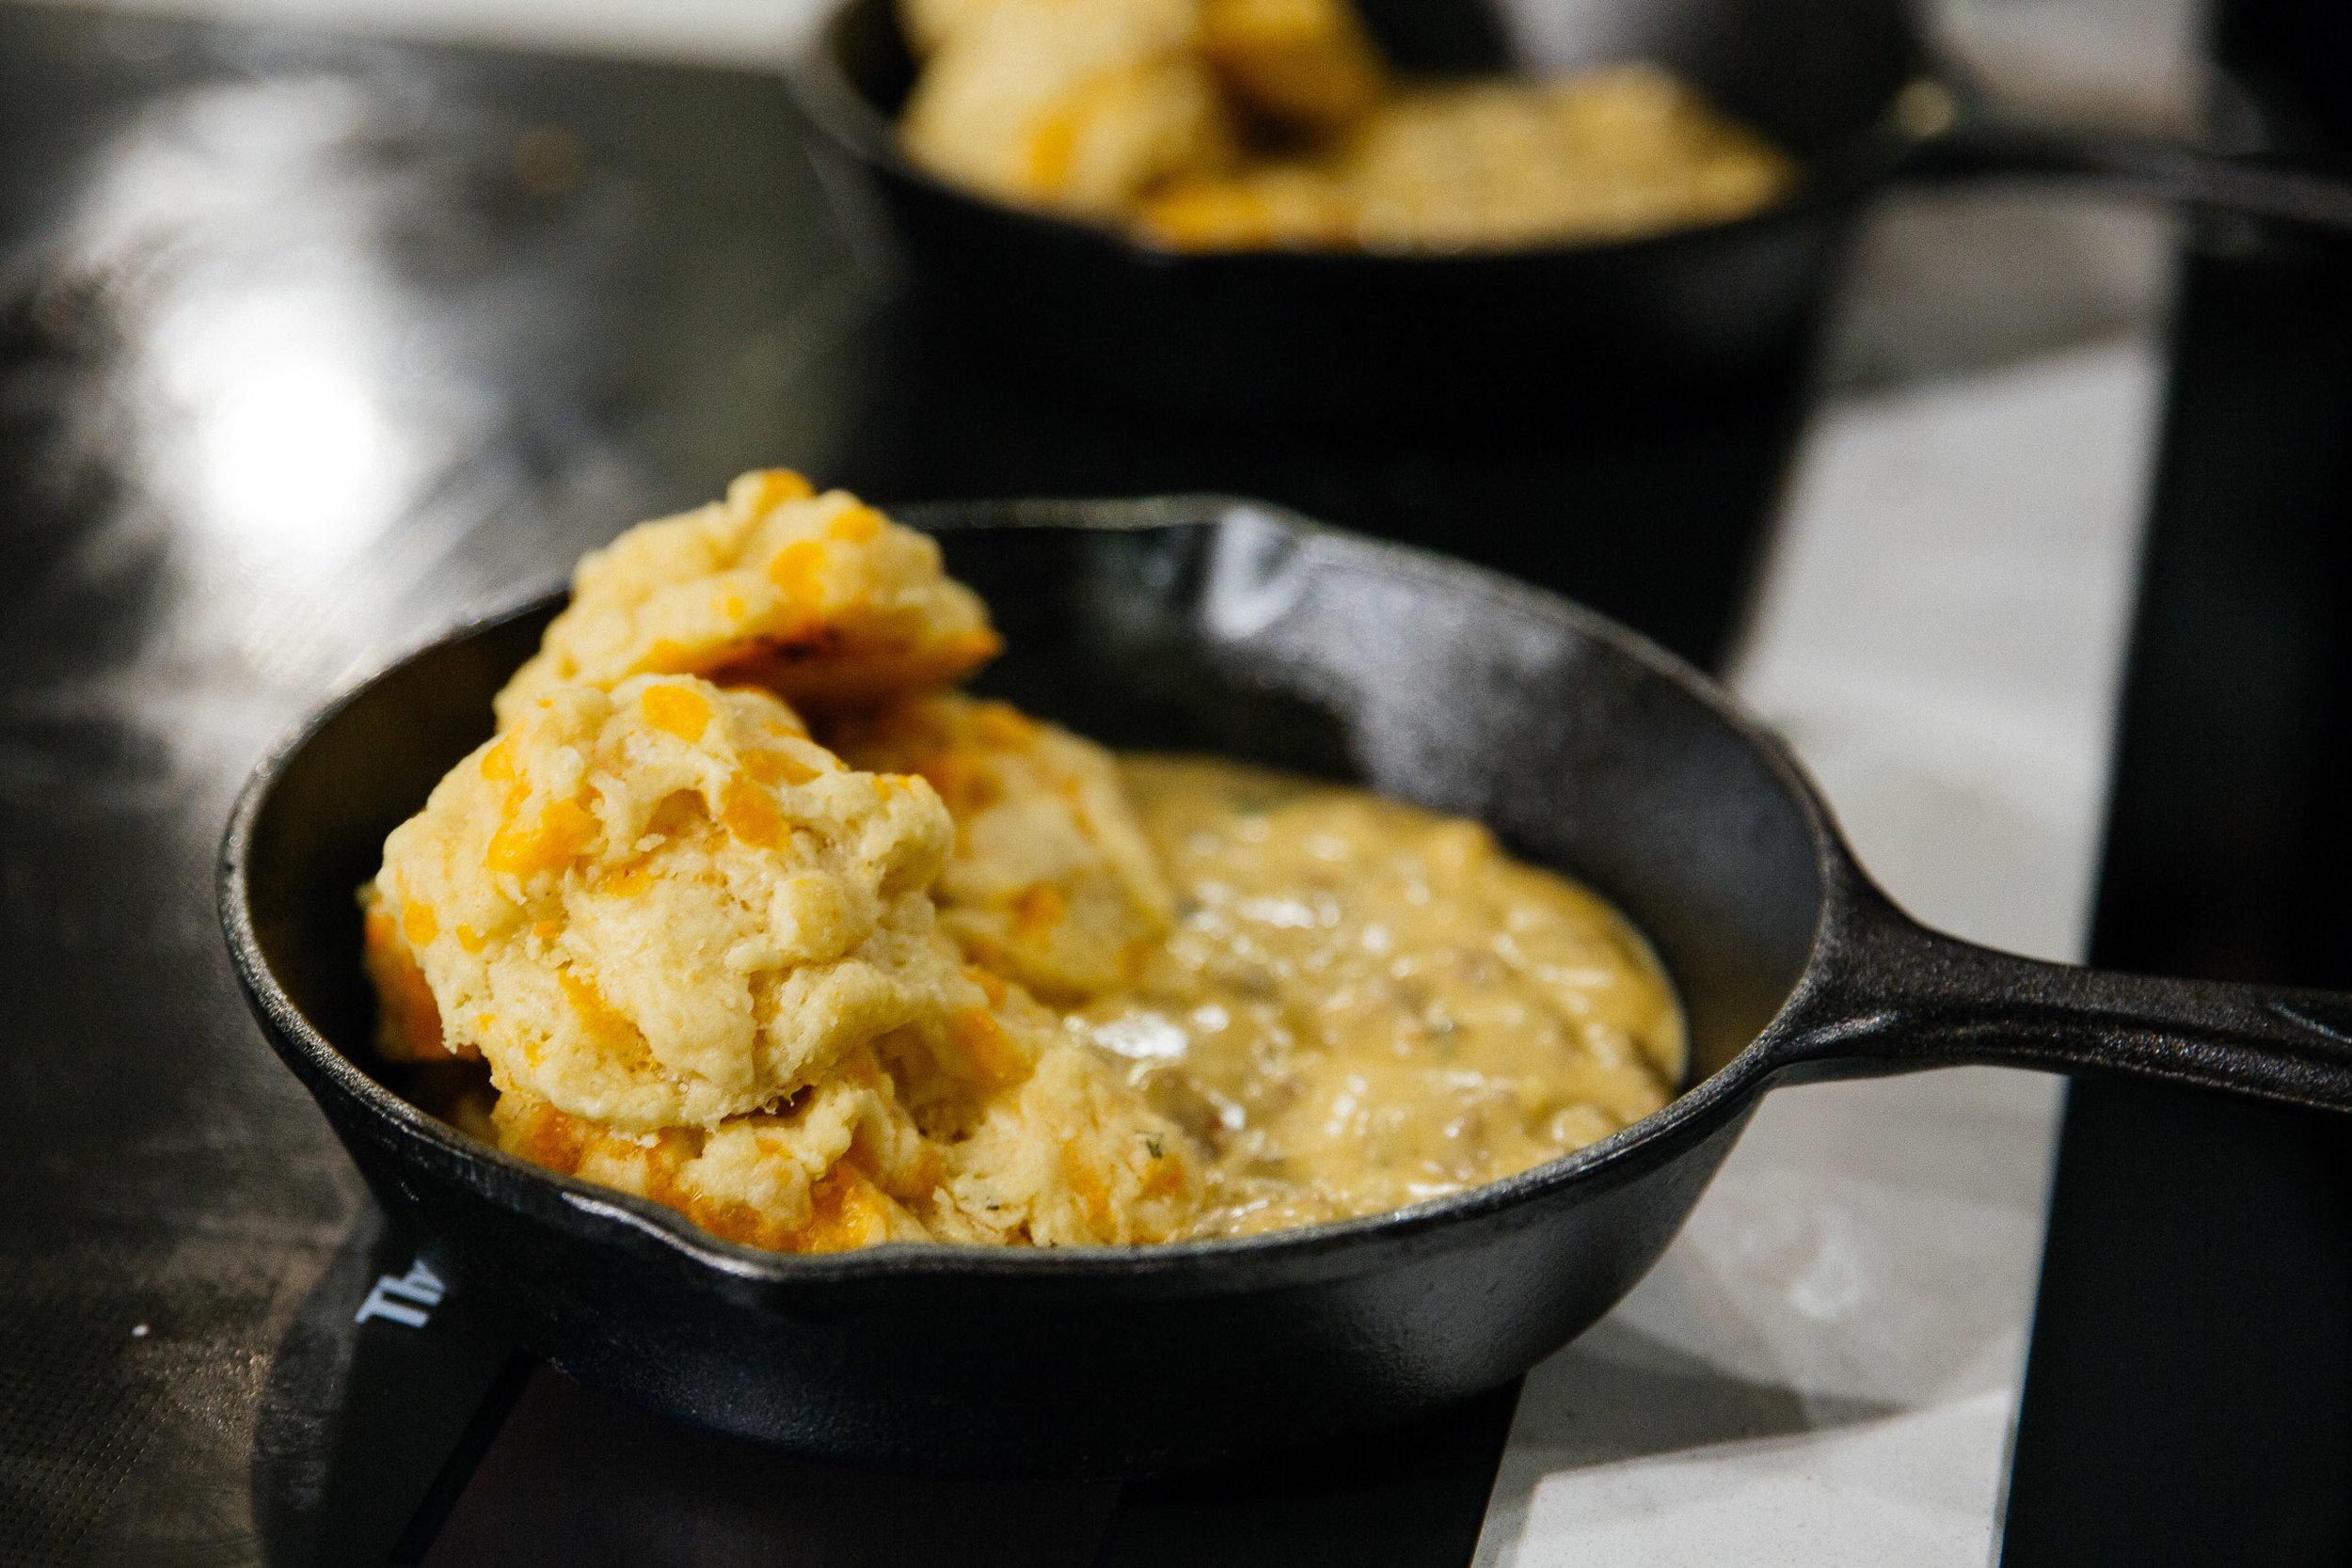 Warm Aged Cheddar Cheese Biscuits + Lamb Merguez Sausage Gravy